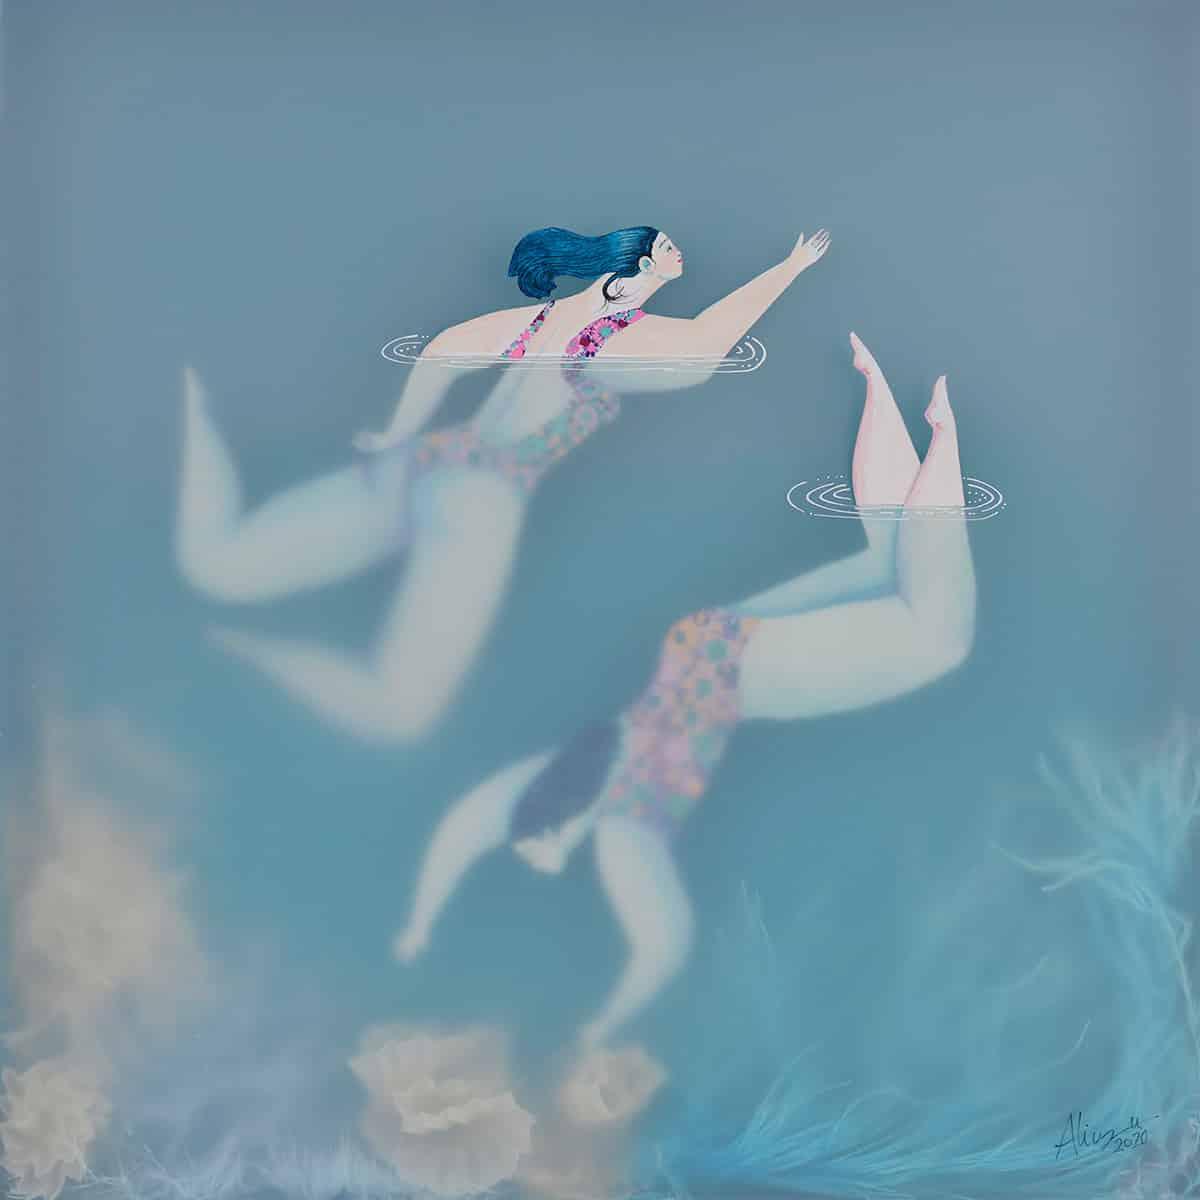 sonia alins mar en calma obra mujeres en agua friends